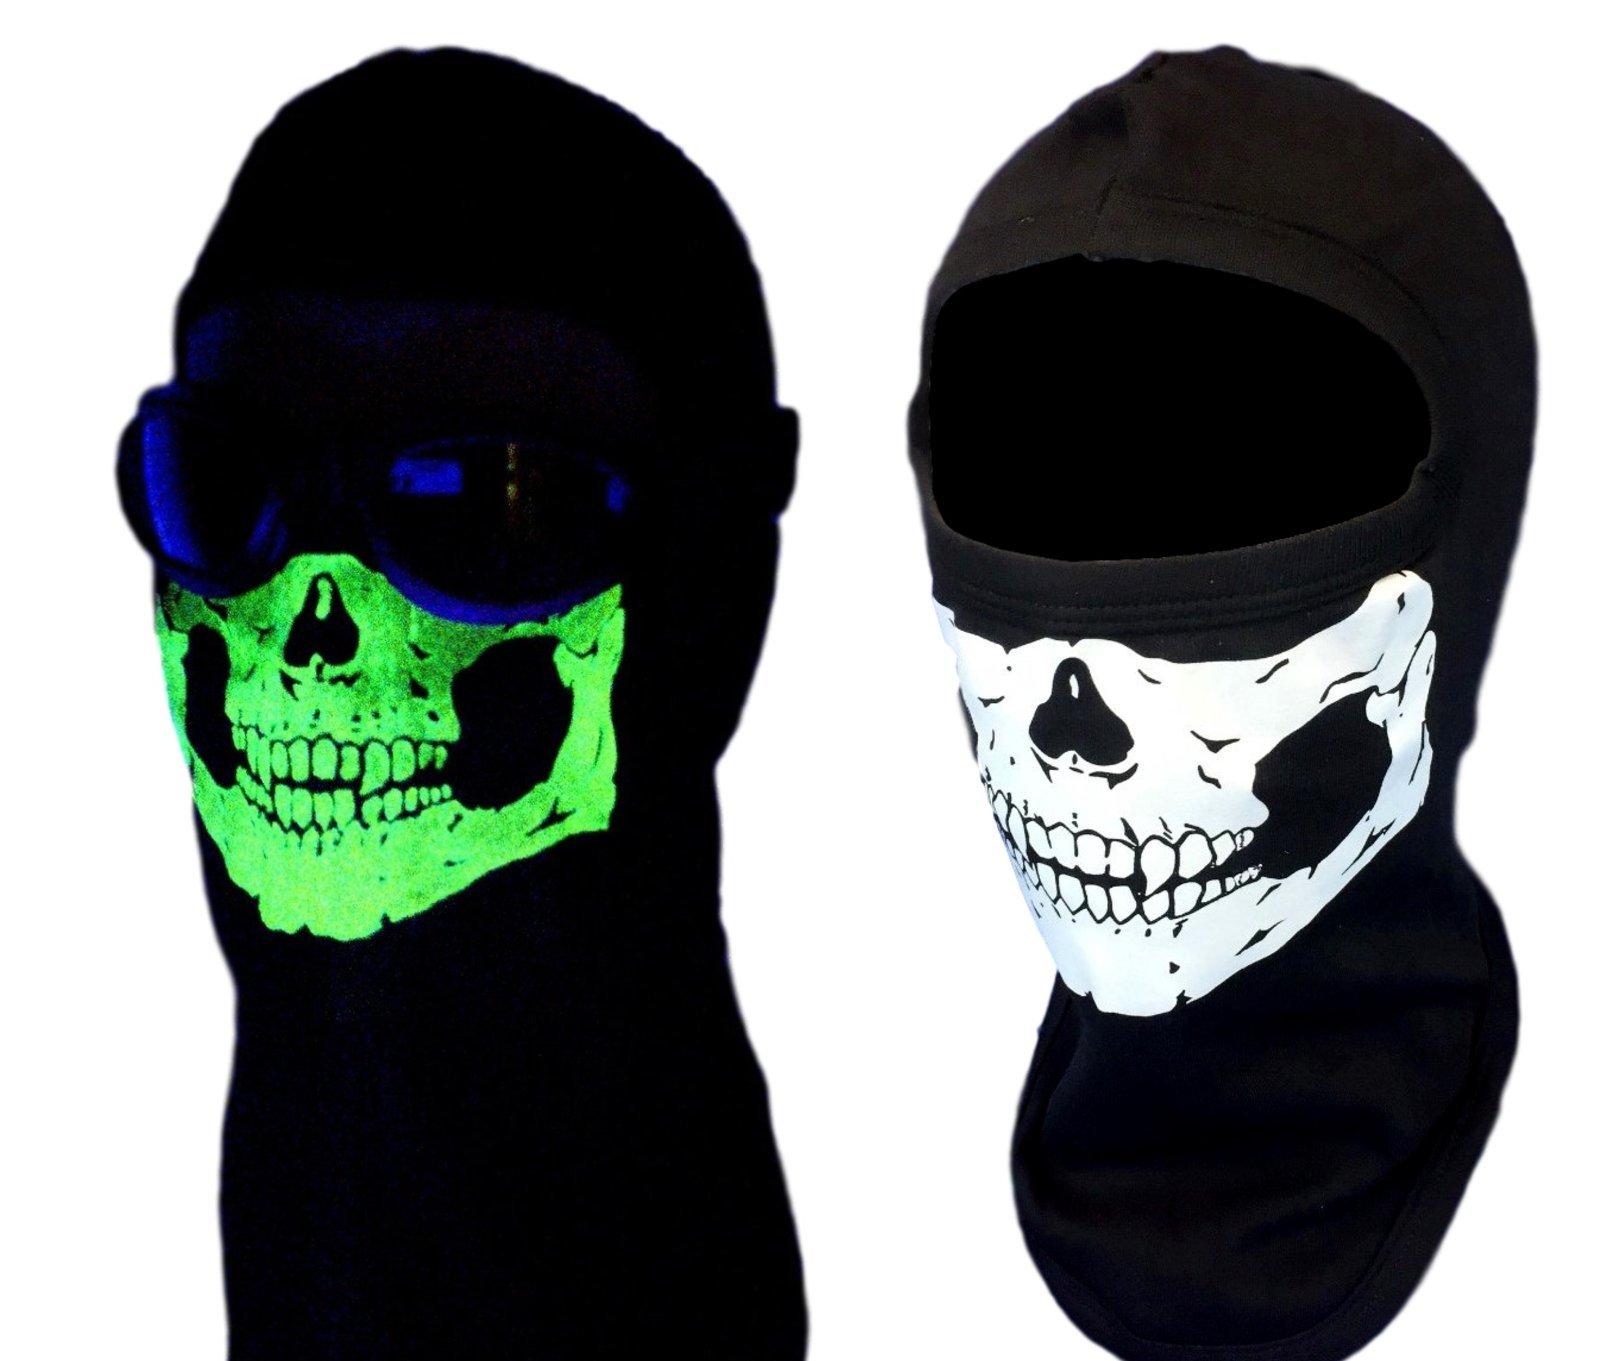 American Made Adult Glow In The Dark Skull Face Ghost Mask Black Ski Hood Large 100% Cotton Black Balaclava